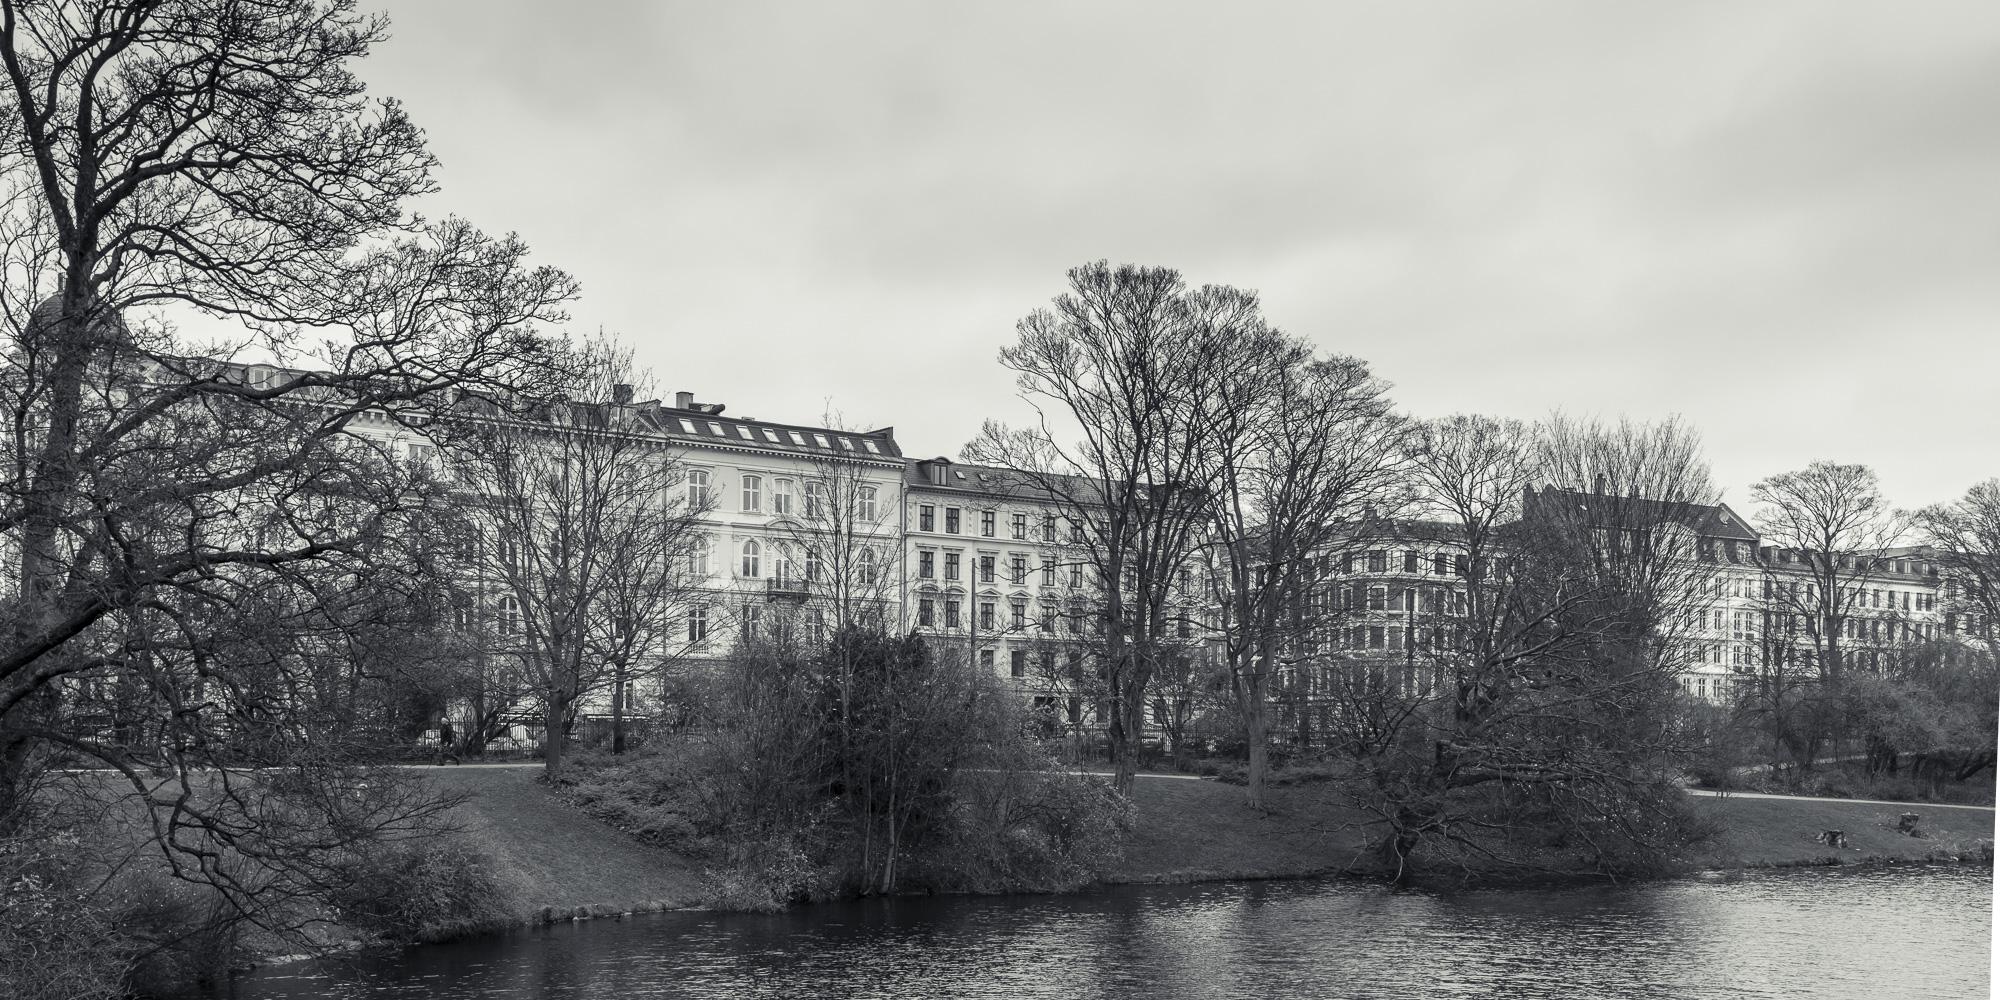 Copenhagen   Copenhagen - Denmark // December 2015